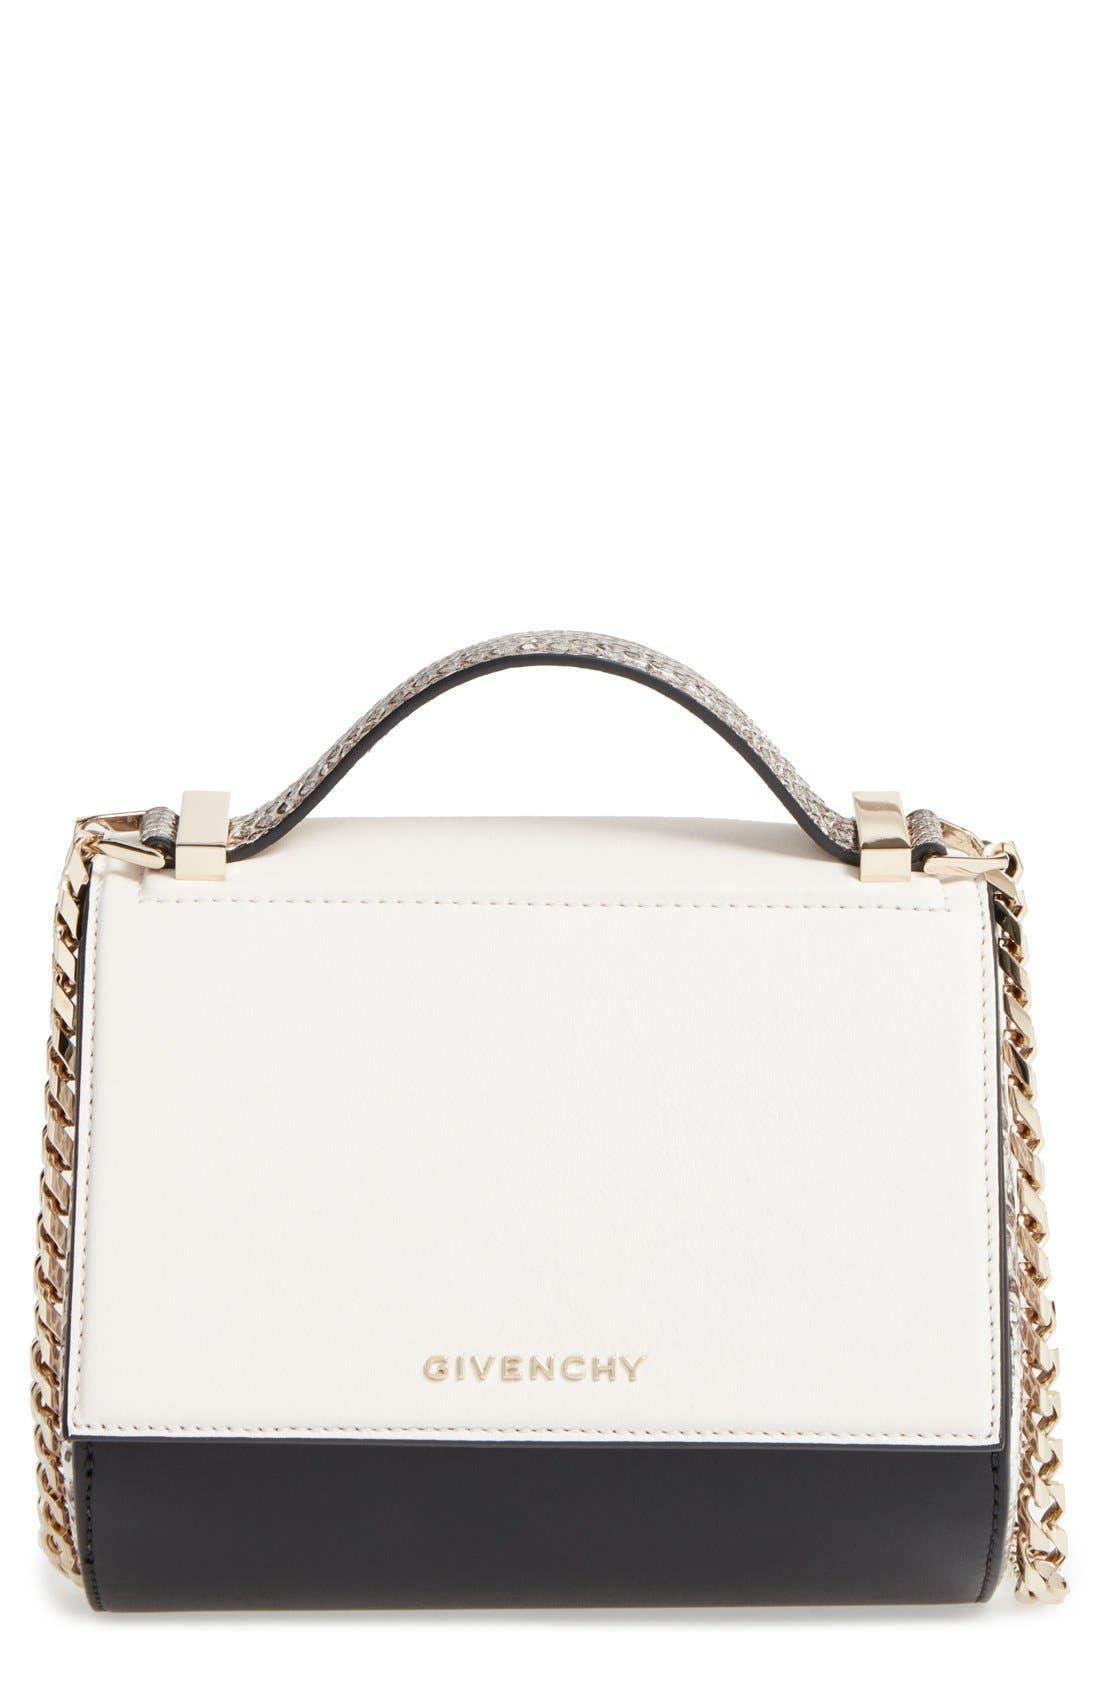 Main Image - Givenchy Pandora Box Genuine Snakeskin Crossbody Bag